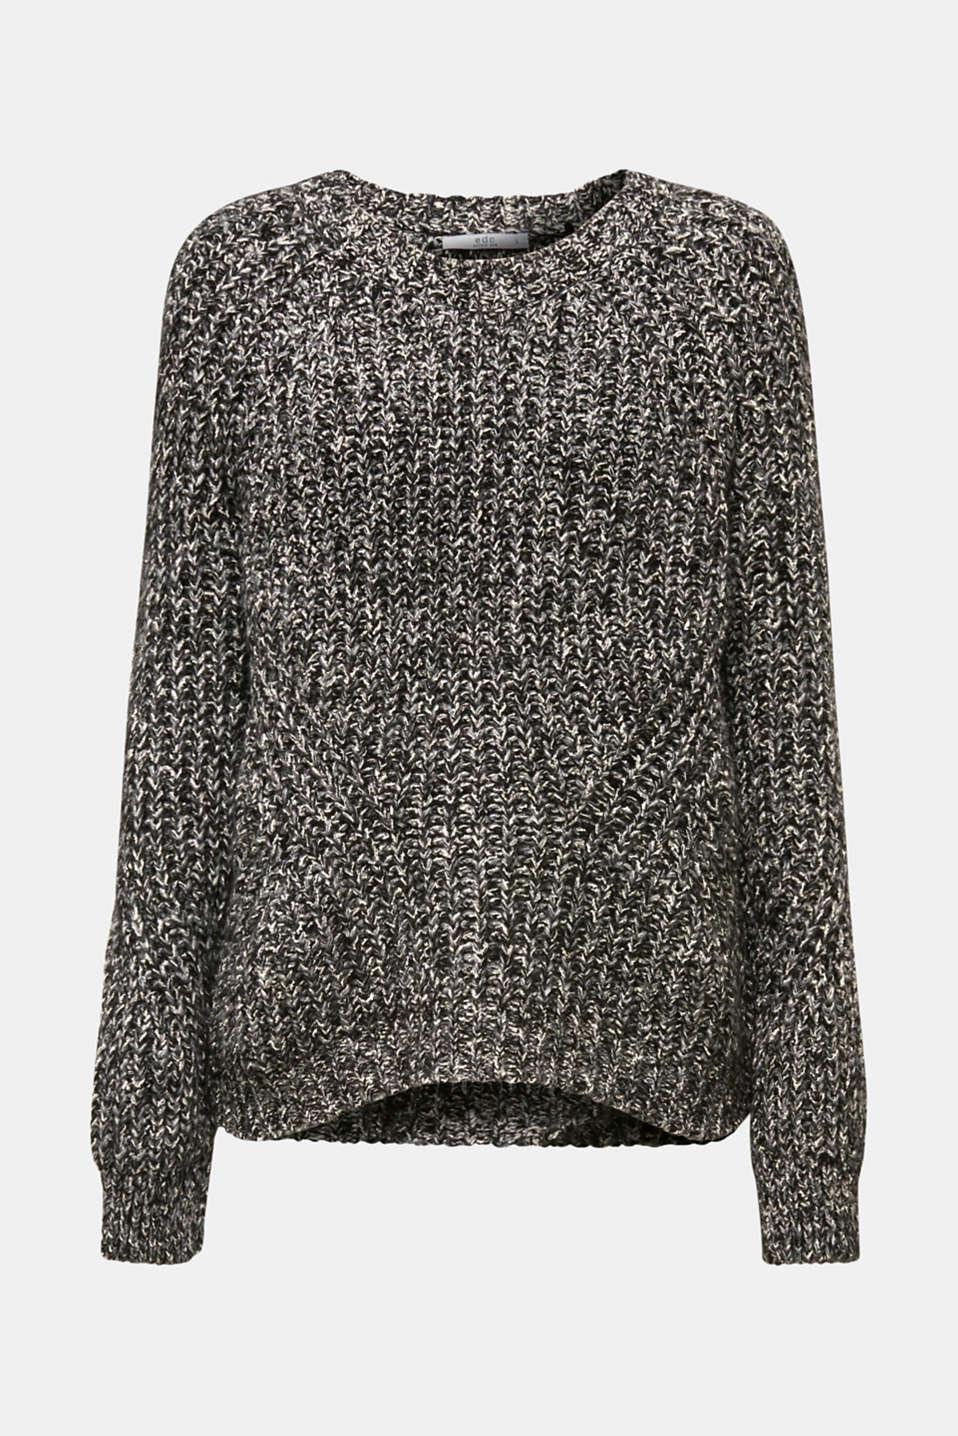 With wool: mouliné jumper, GUNMETAL 4, detail image number 7